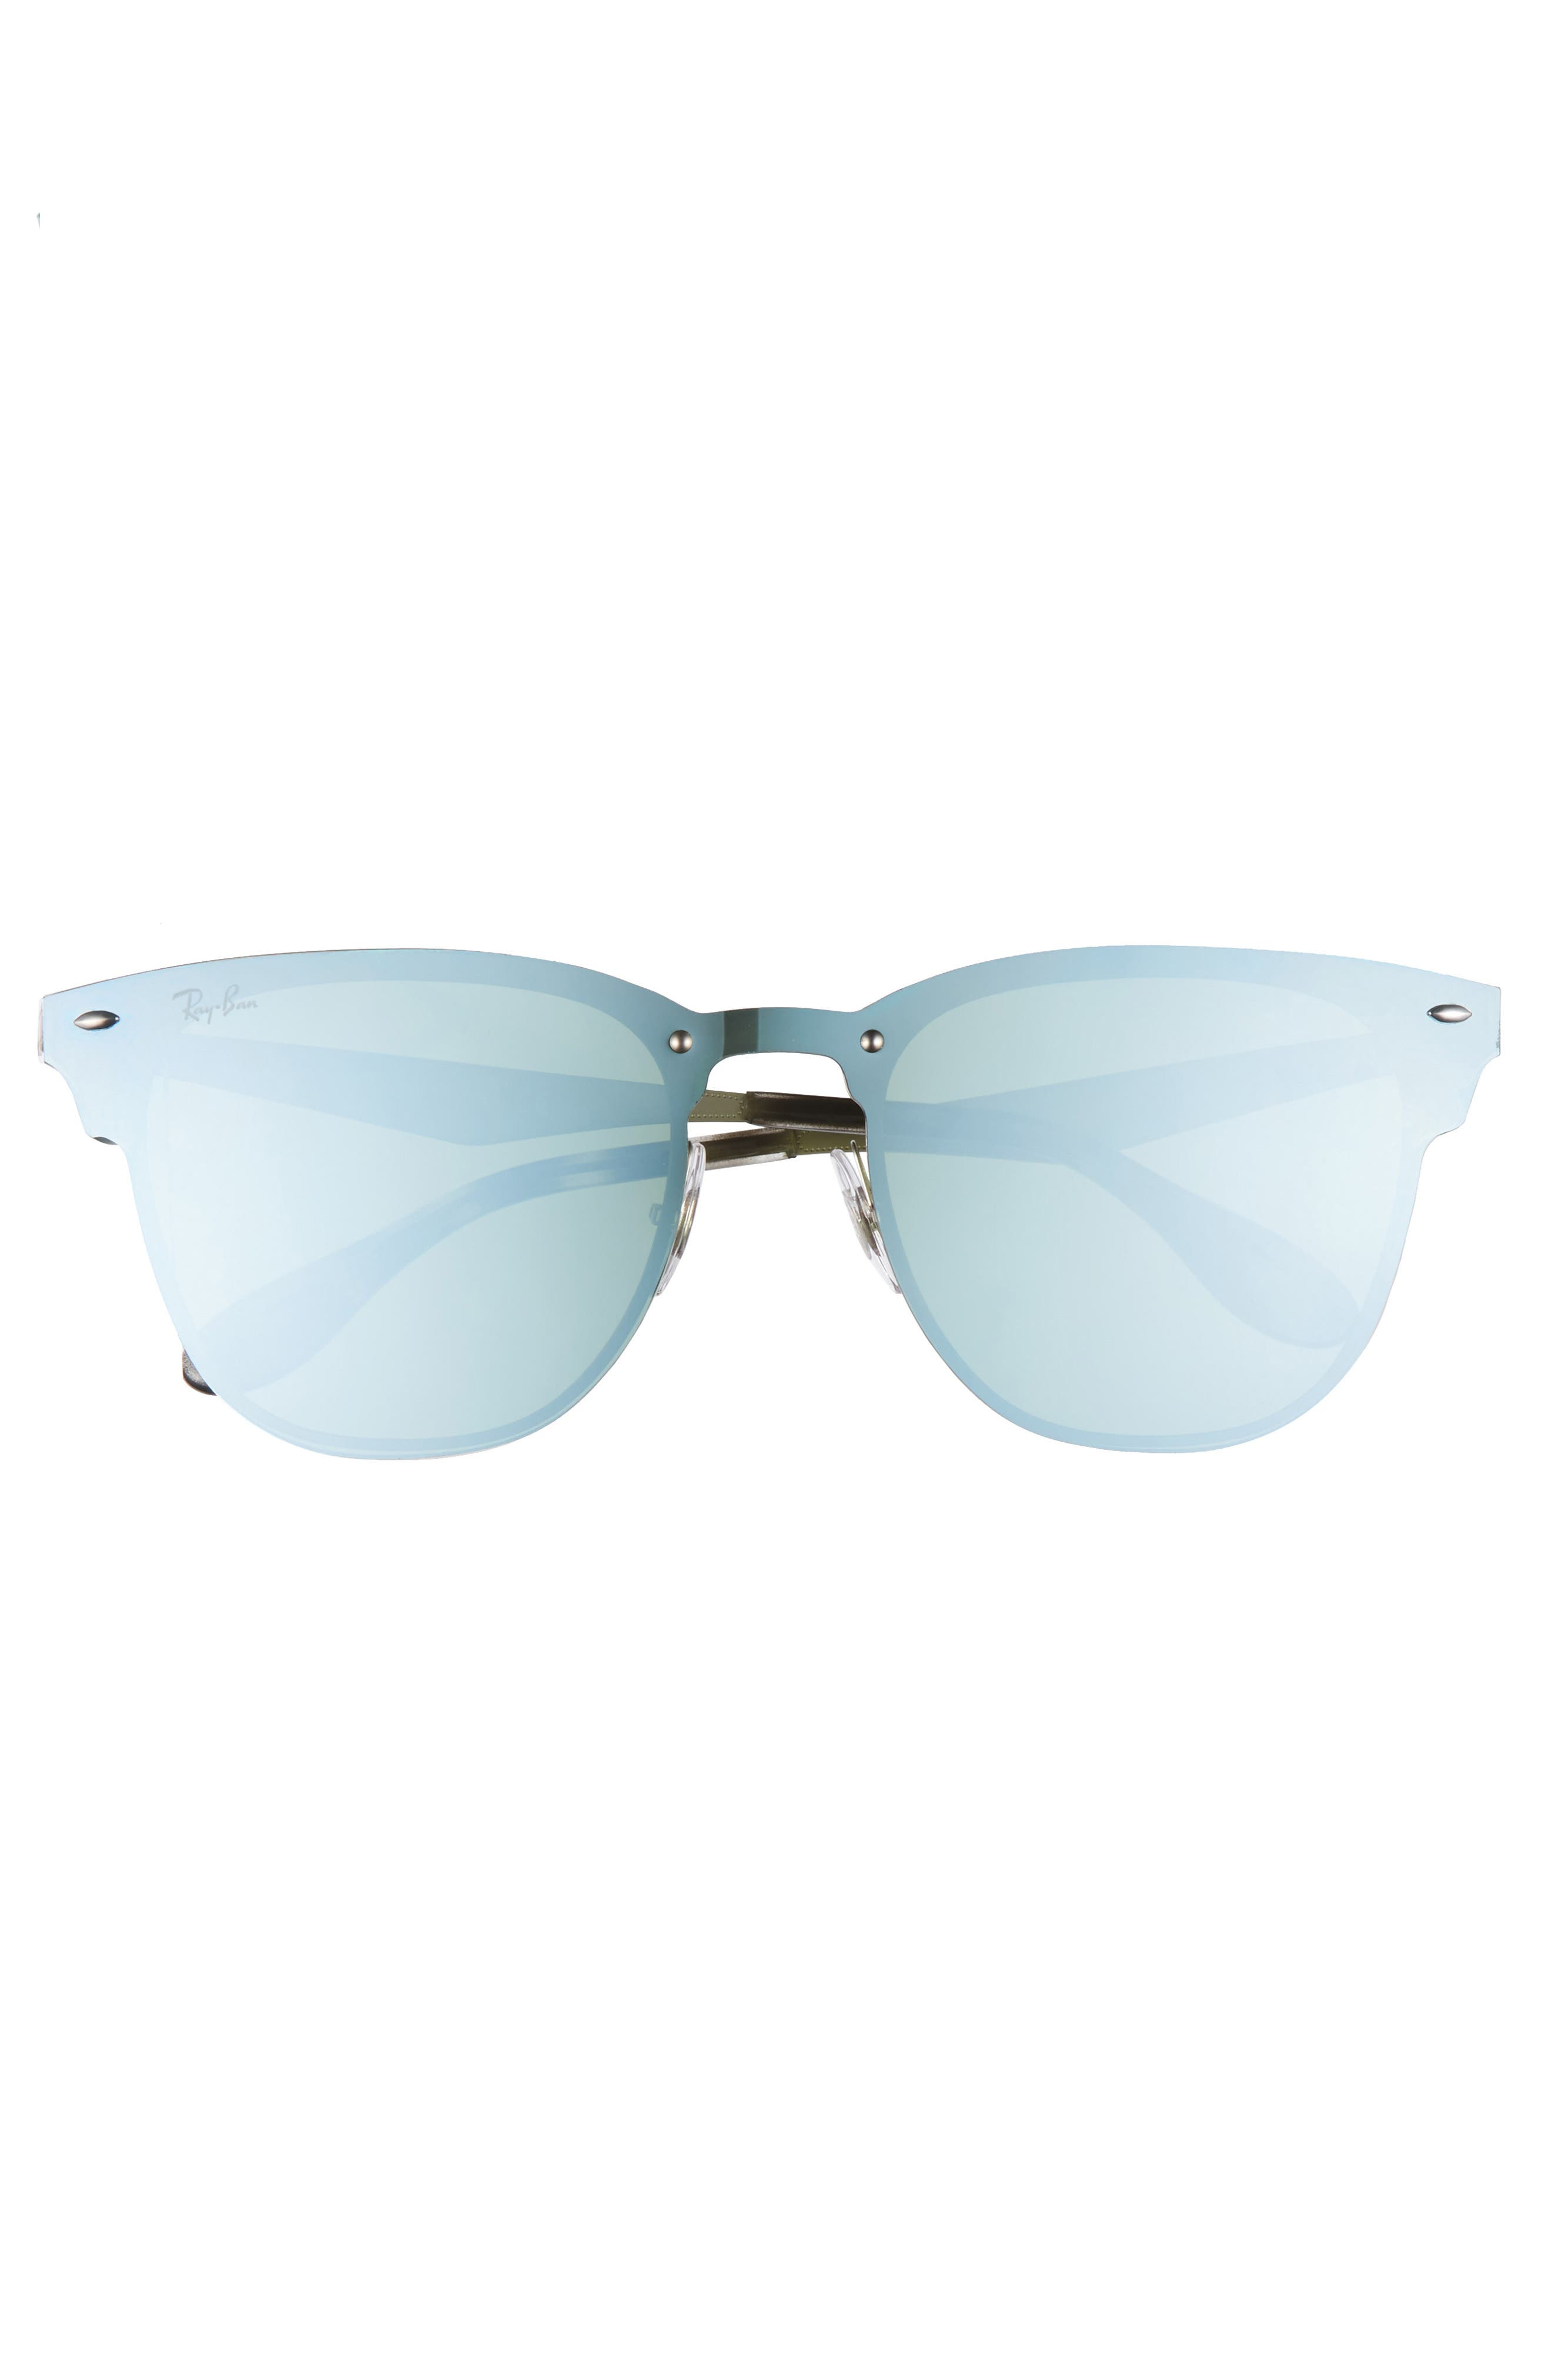 52mm Mirrored Sunglasses,                             Alternate thumbnail 3, color,                             040